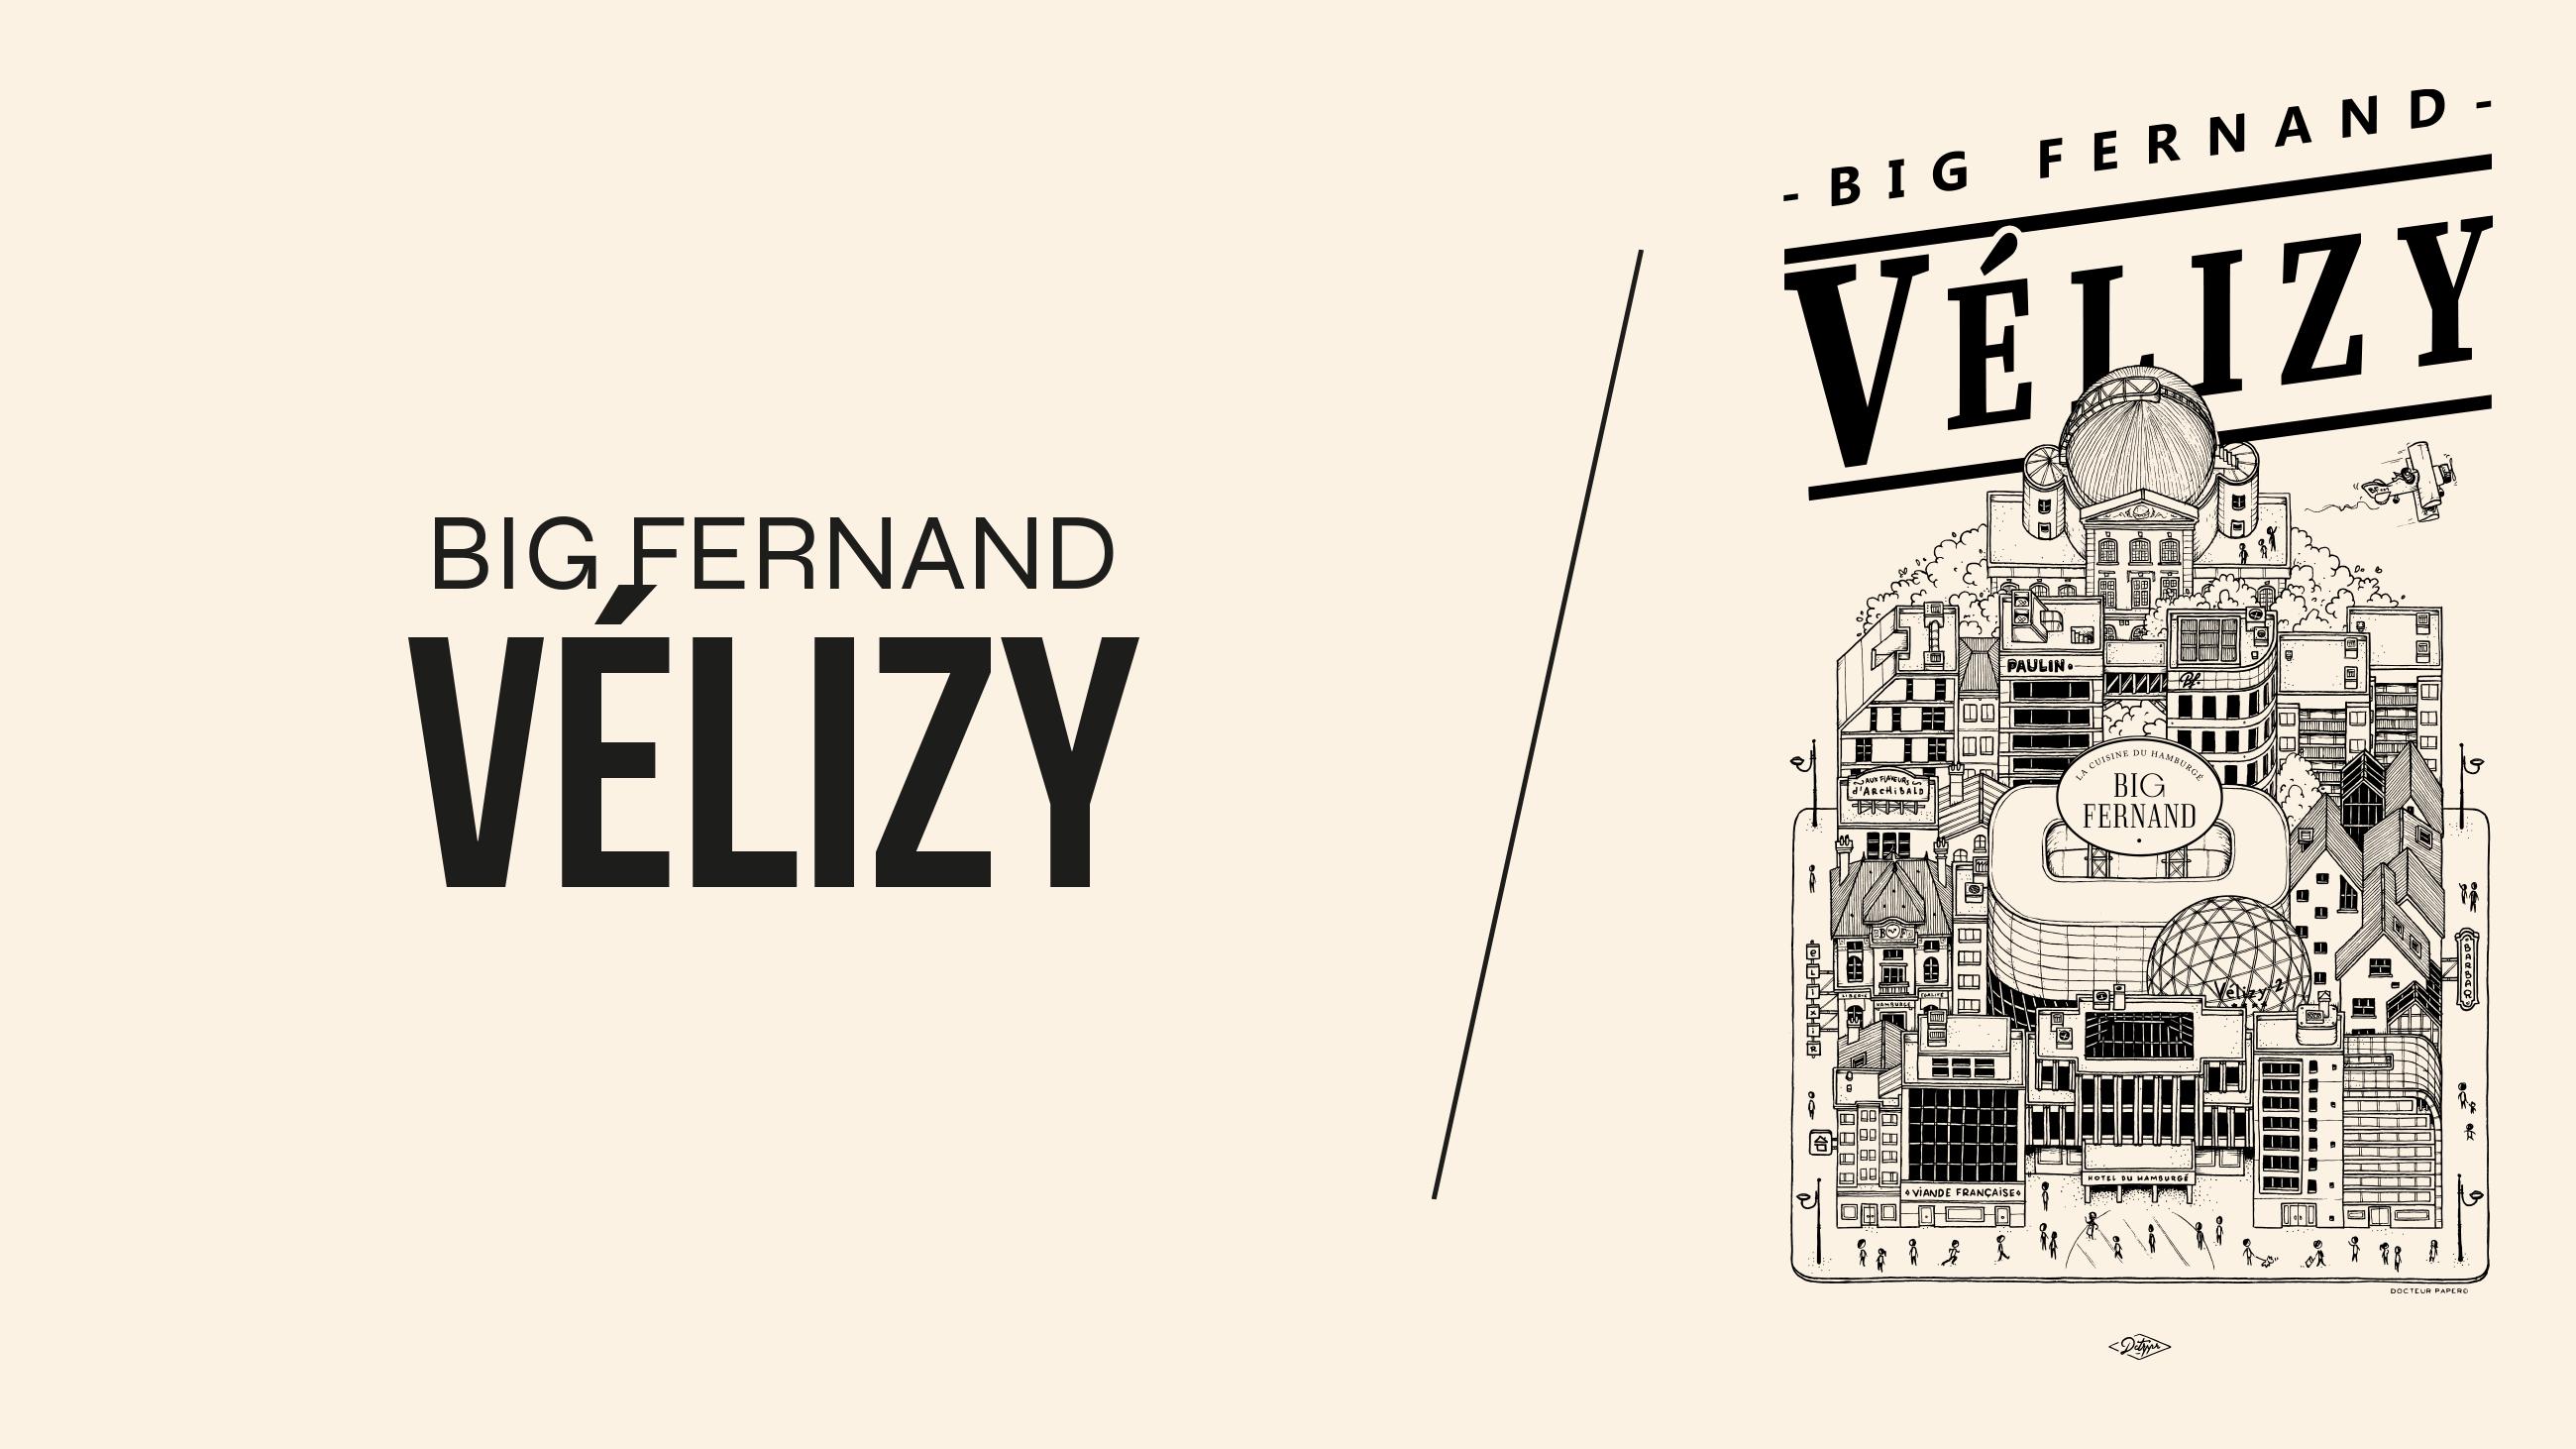 VELIZY 2 : UN BIG FERNAND S'Y INSTALLE